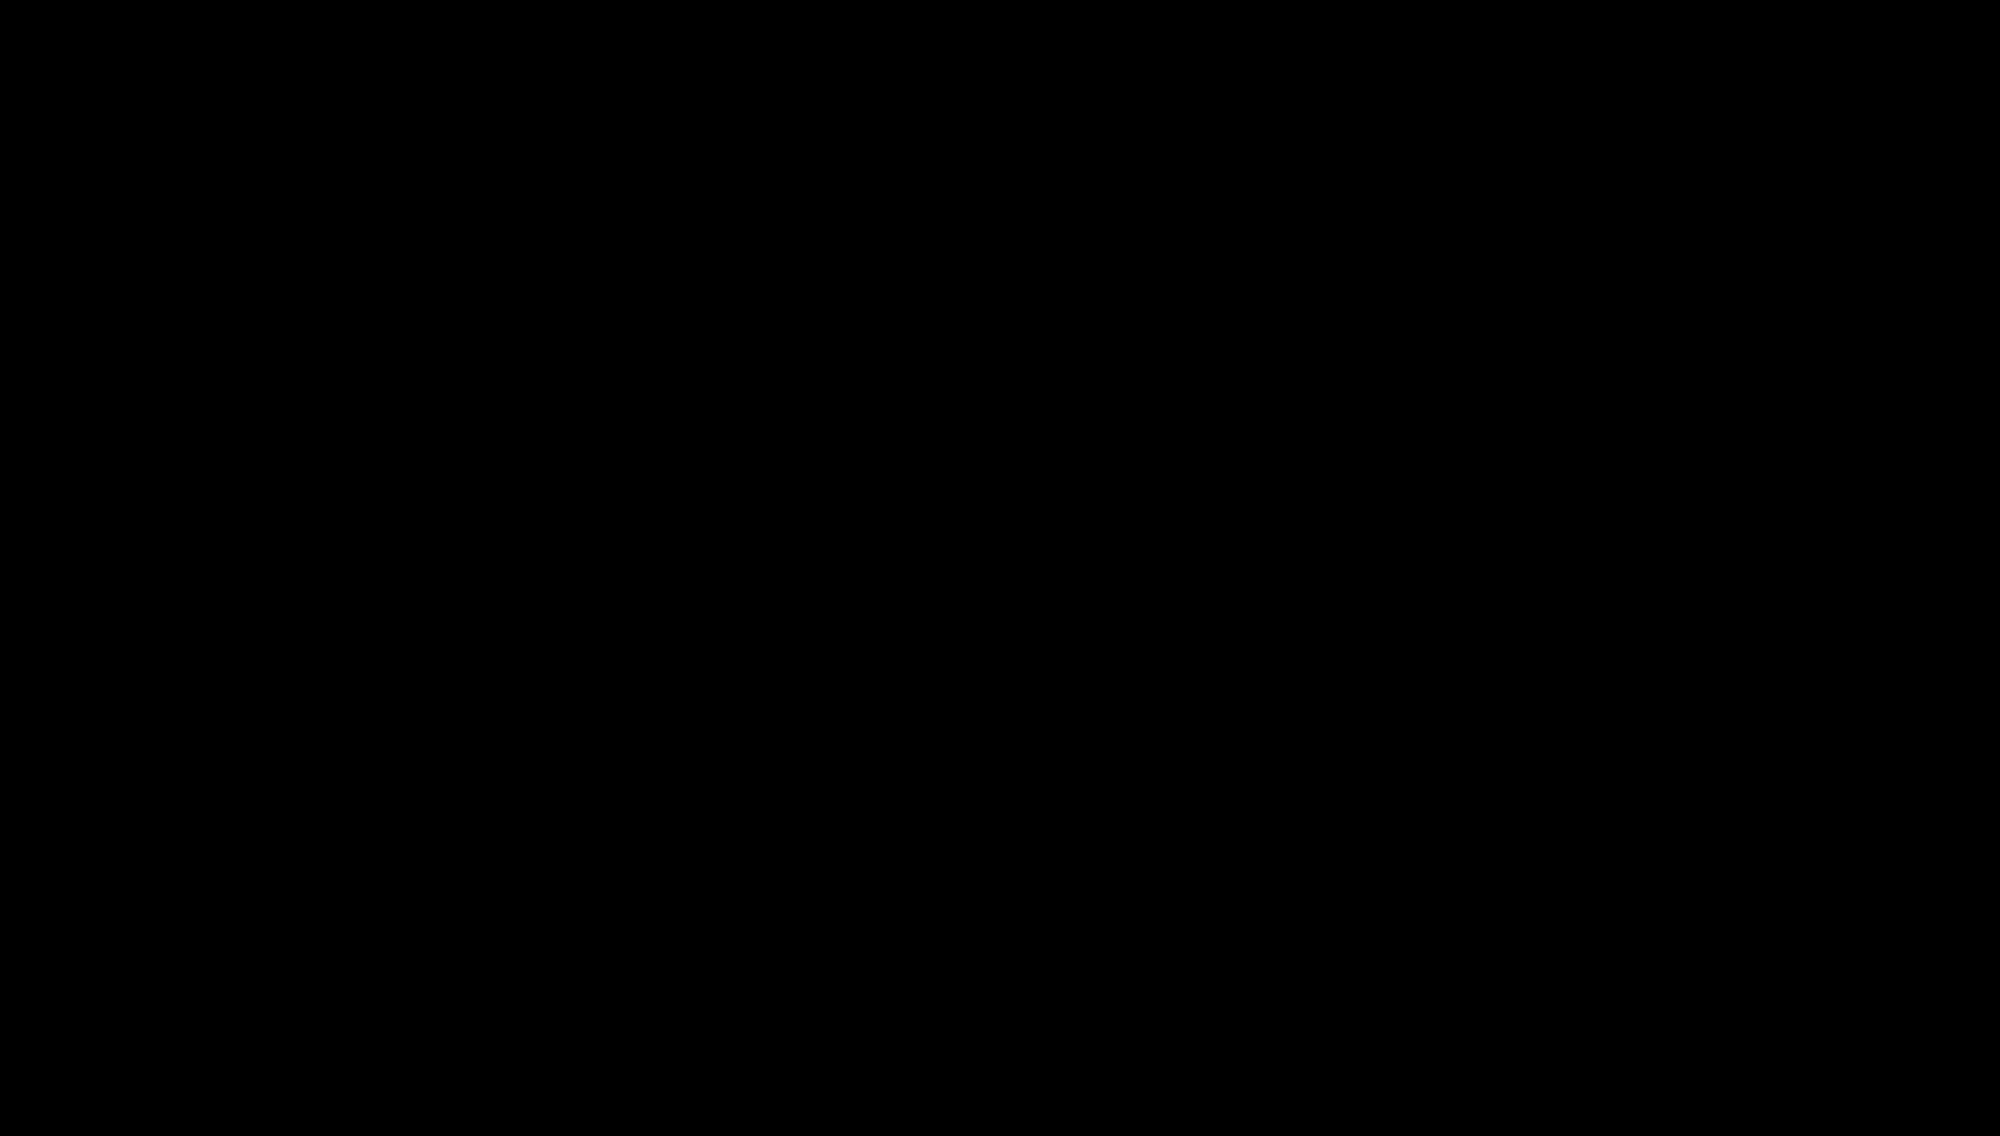 File wikimedia commons open. Clipart diamond svg